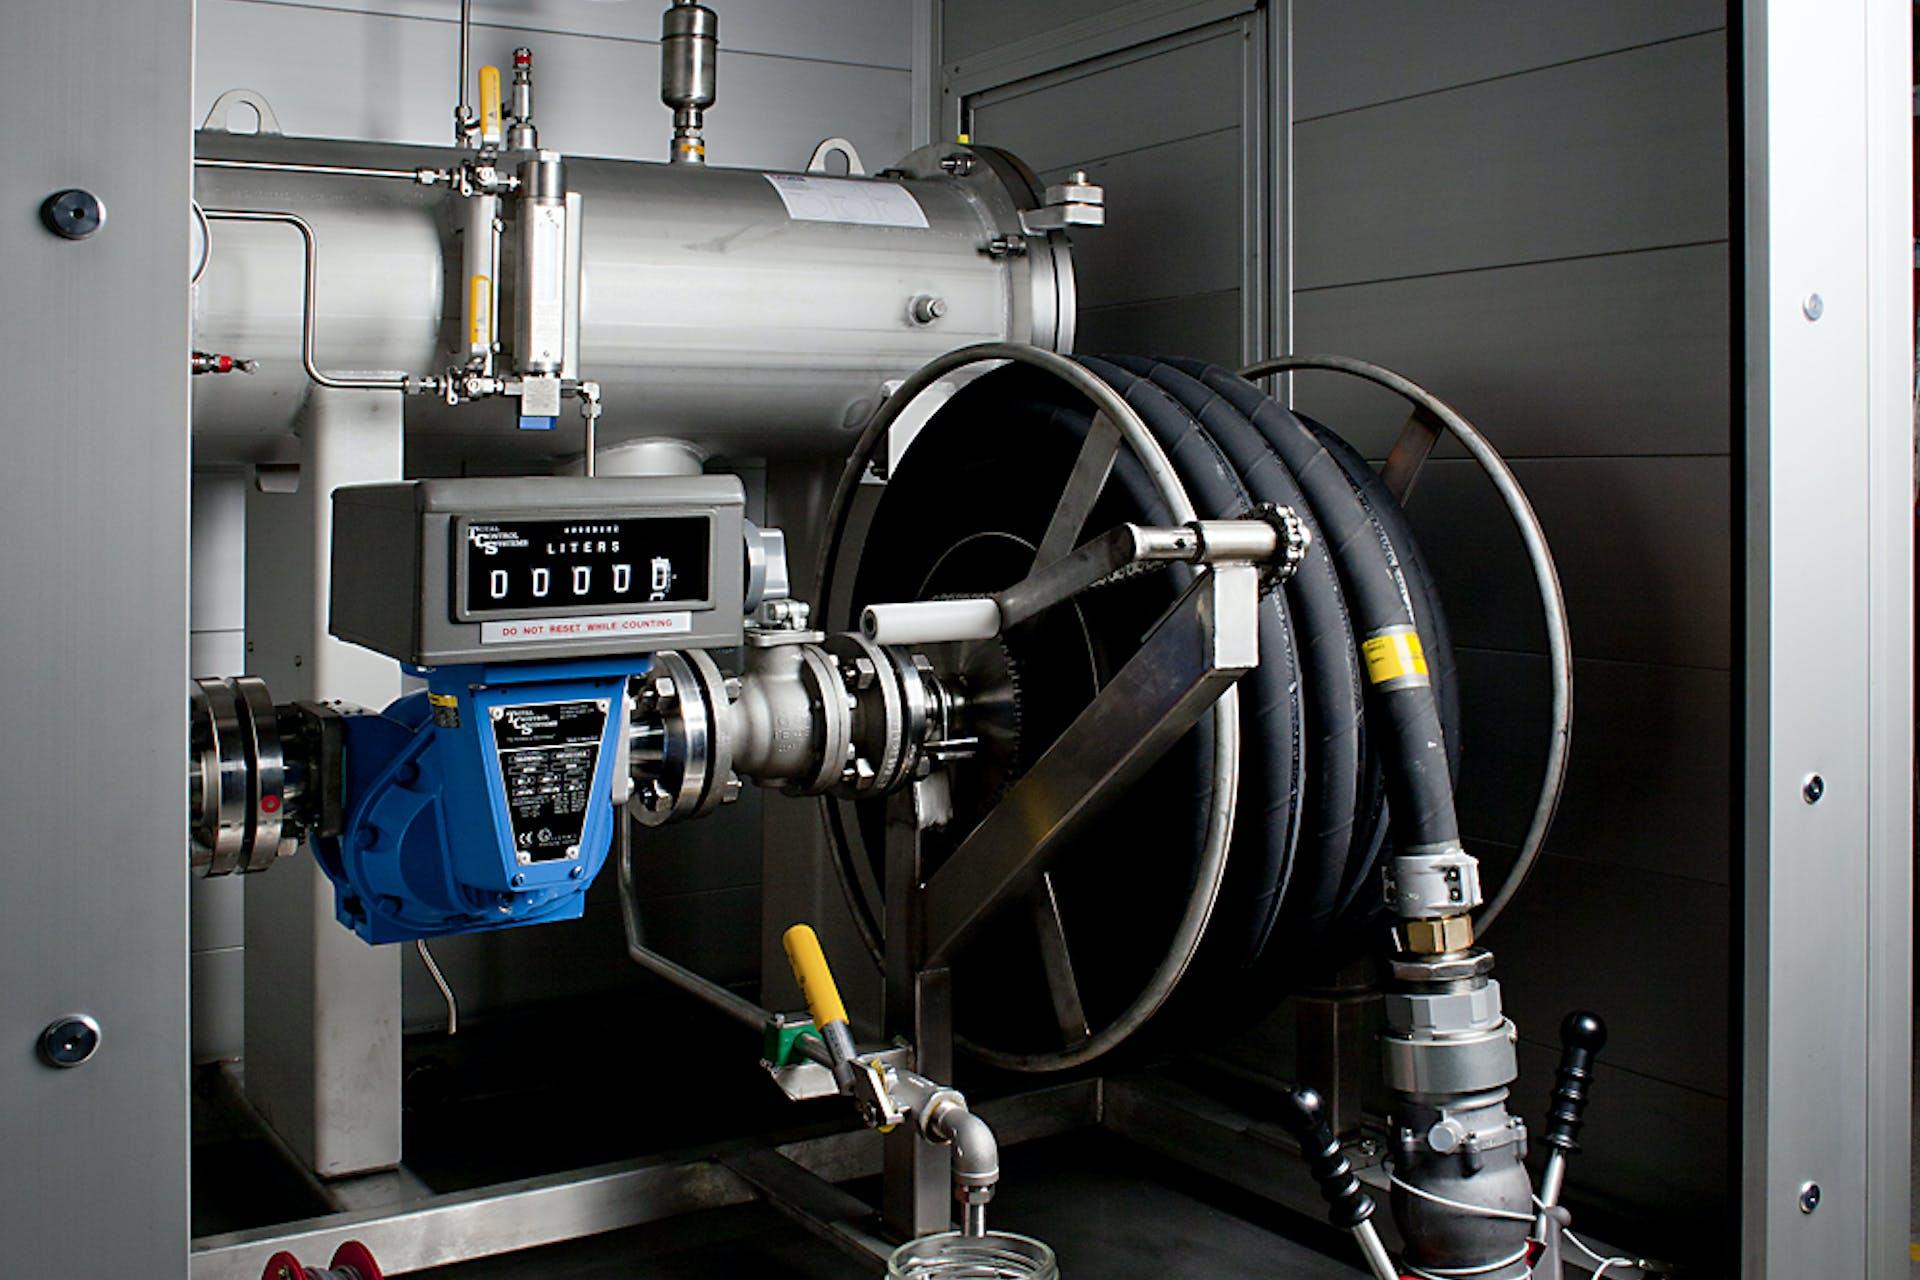 Dispenser Unit Jet A-1 Helifuel Jet Fuel Kerosene Aviation Fuel